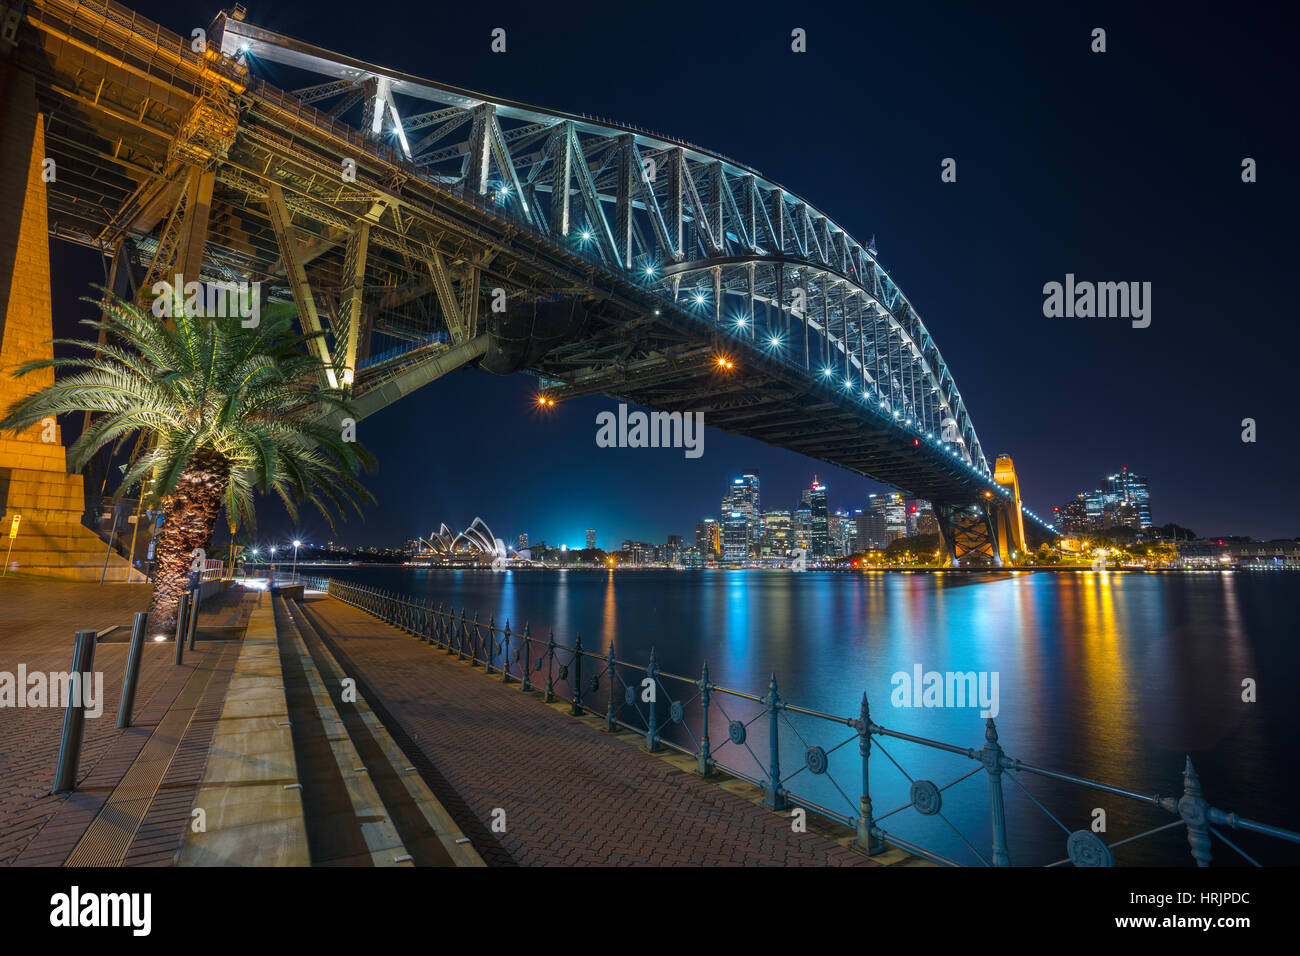 Sydney. Cityscape image of Sydney, Australia with Harbour Bridge at night. - Stock Image